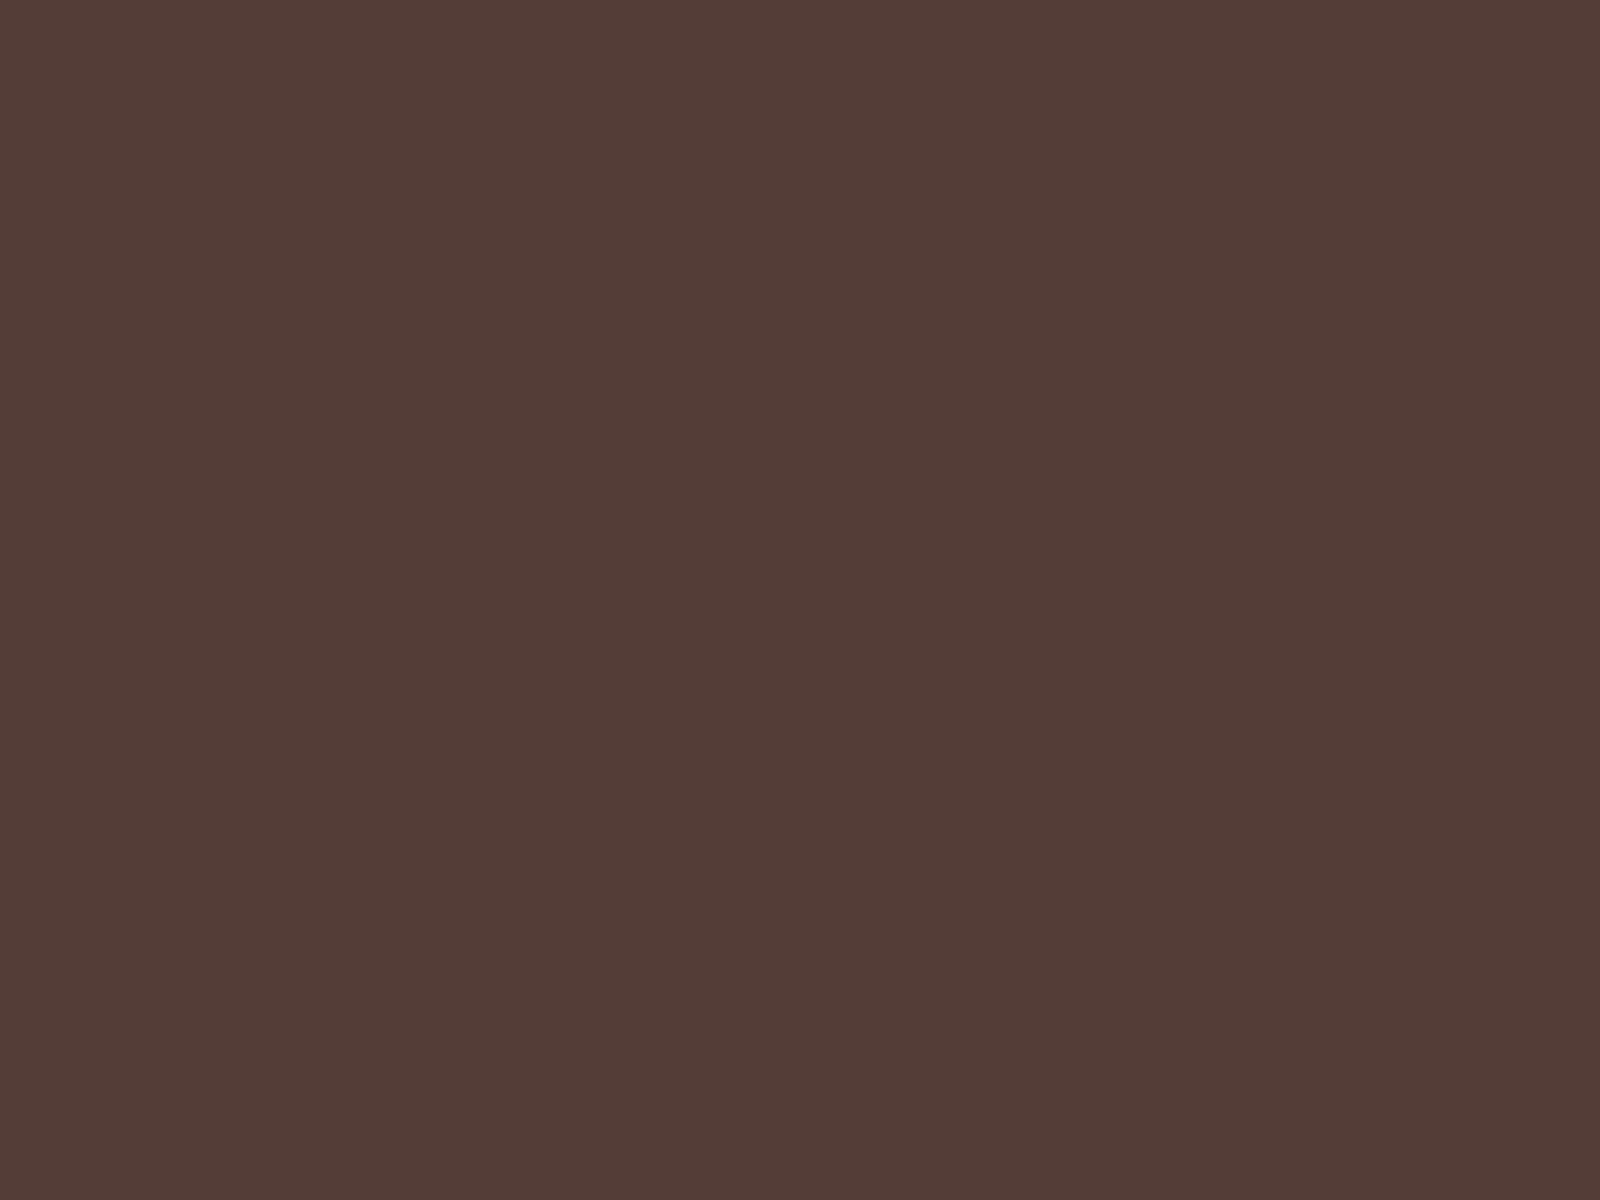 1600x1200 Dark Liver Horses Solid Color Background